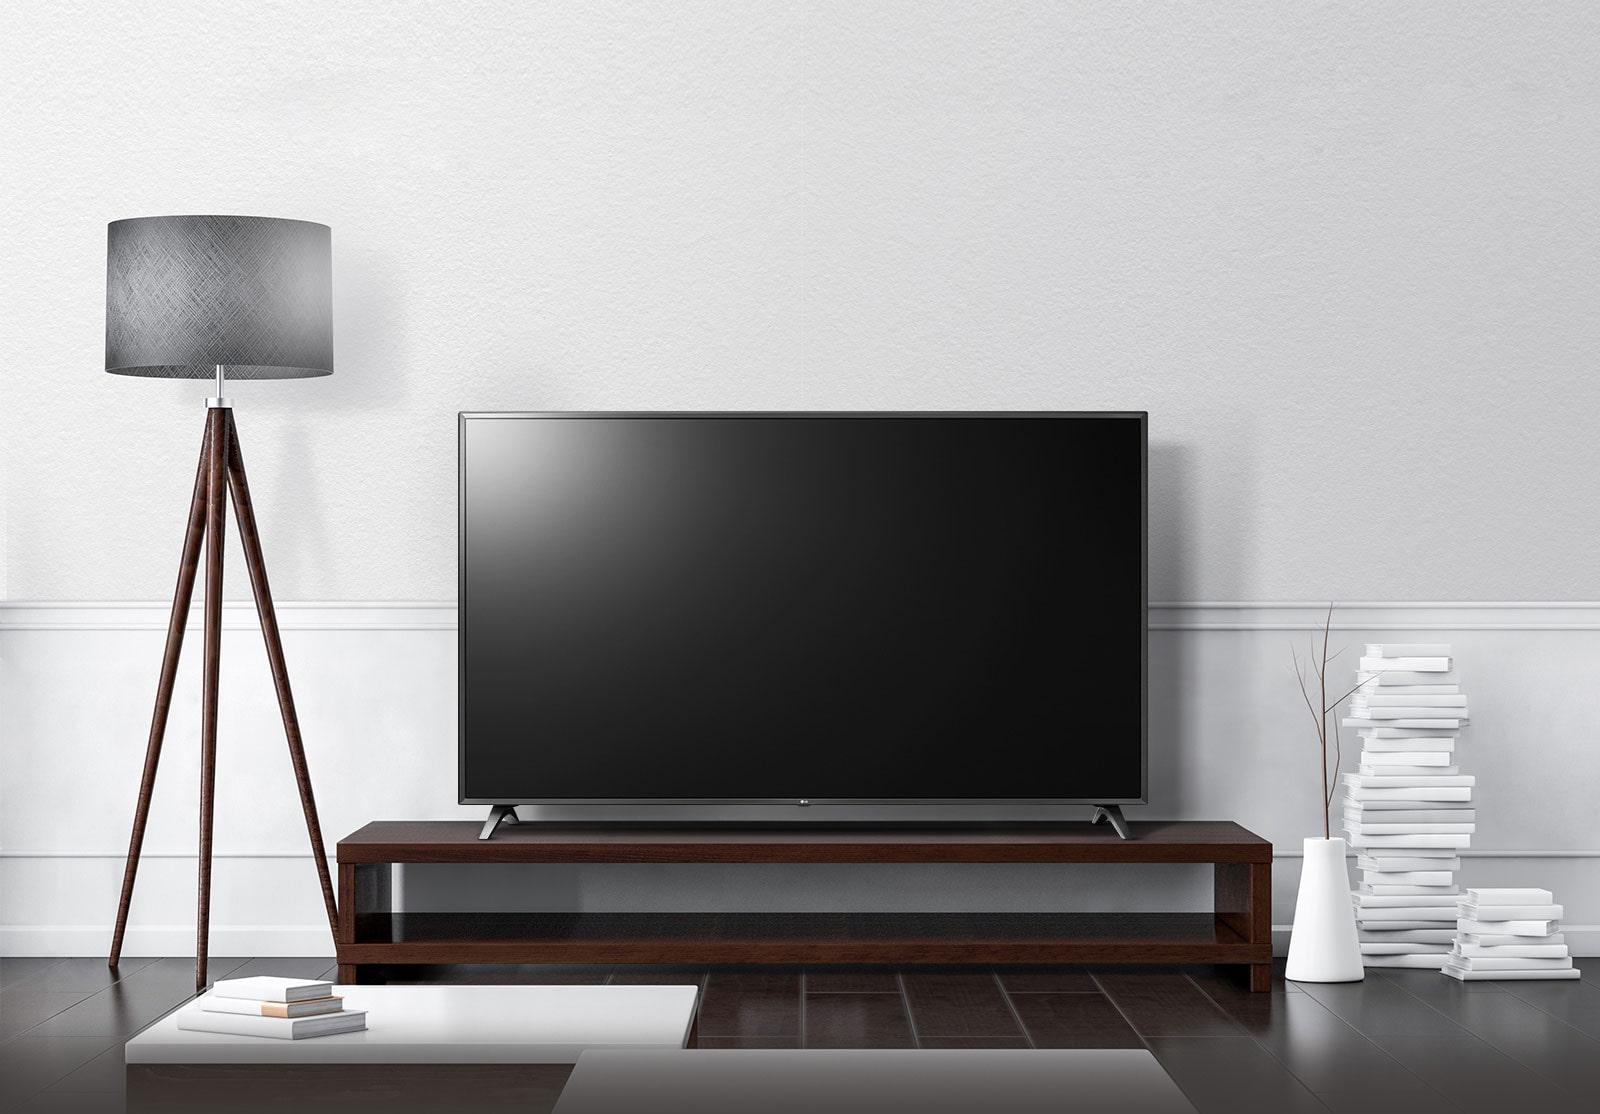 D07_TV-UHD-70-UM73-07-Design-Desktop